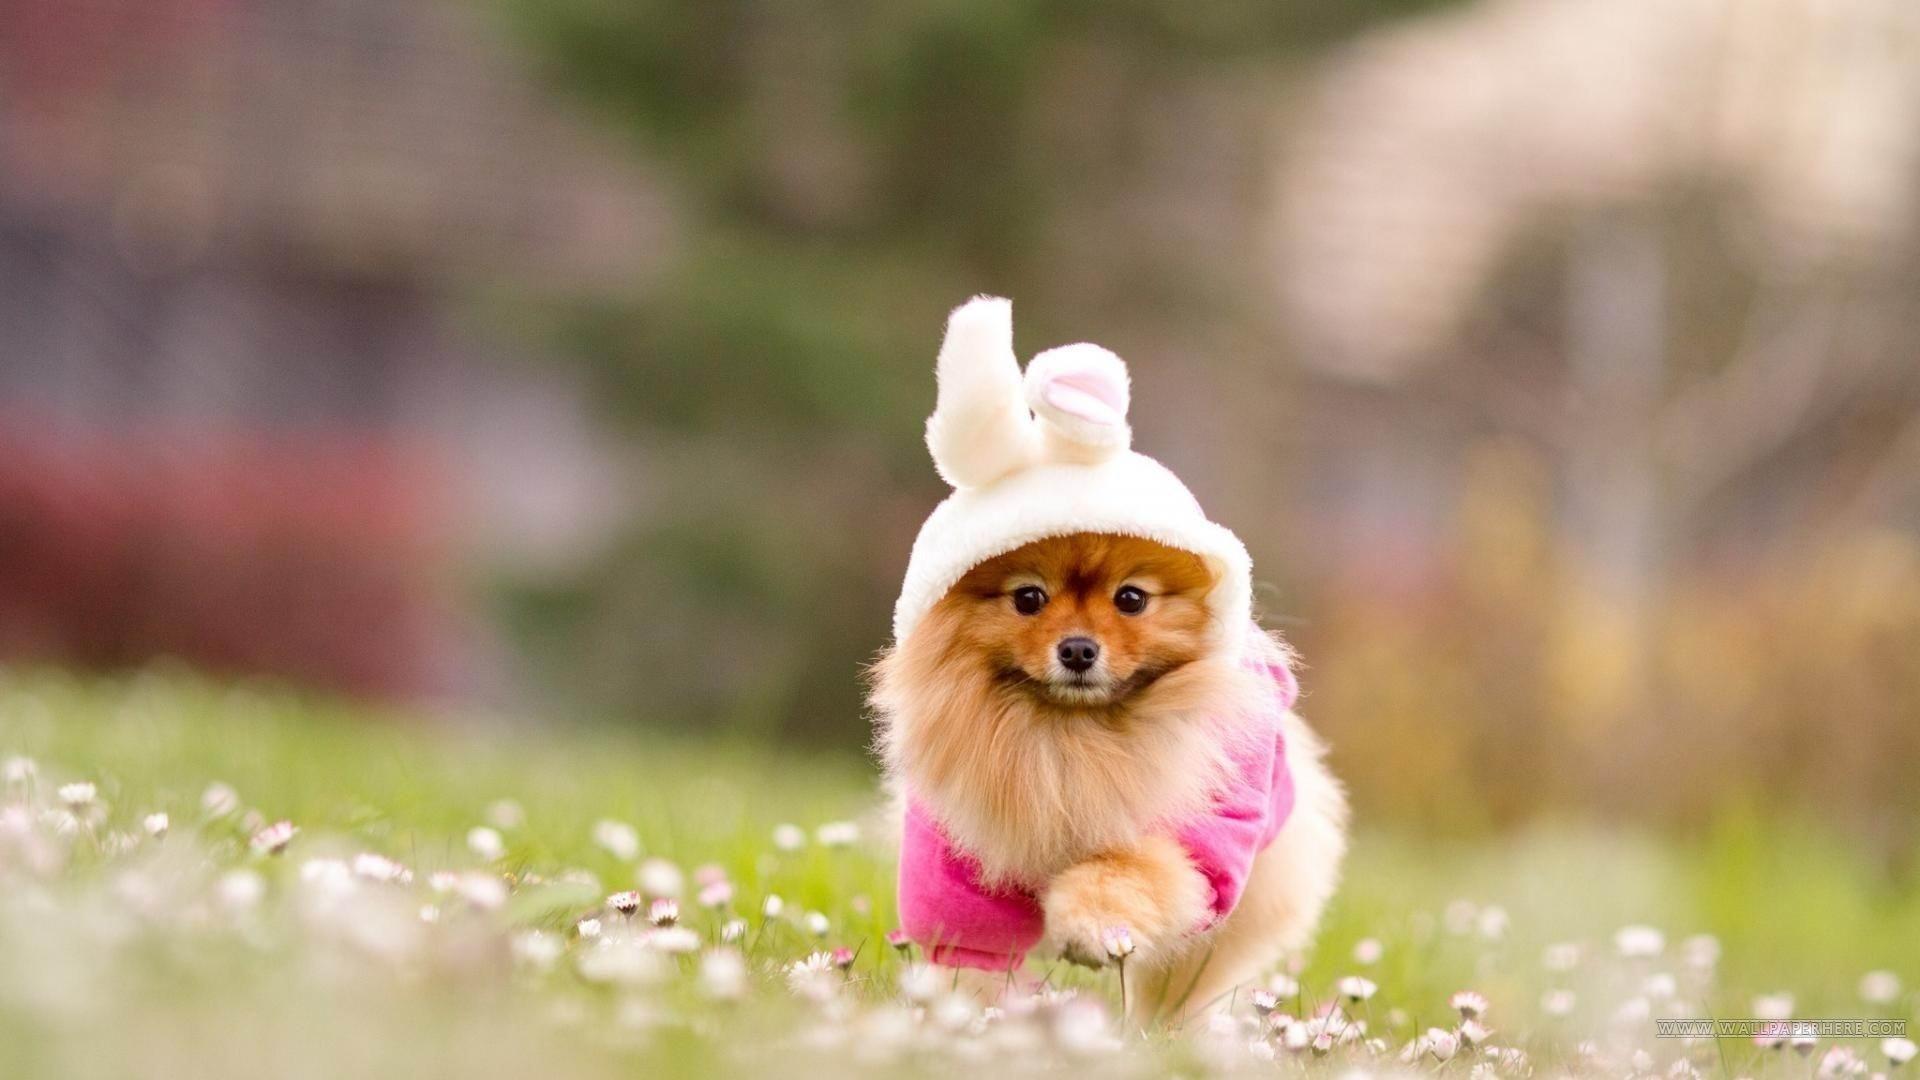 cute puppy desktop backgrounds